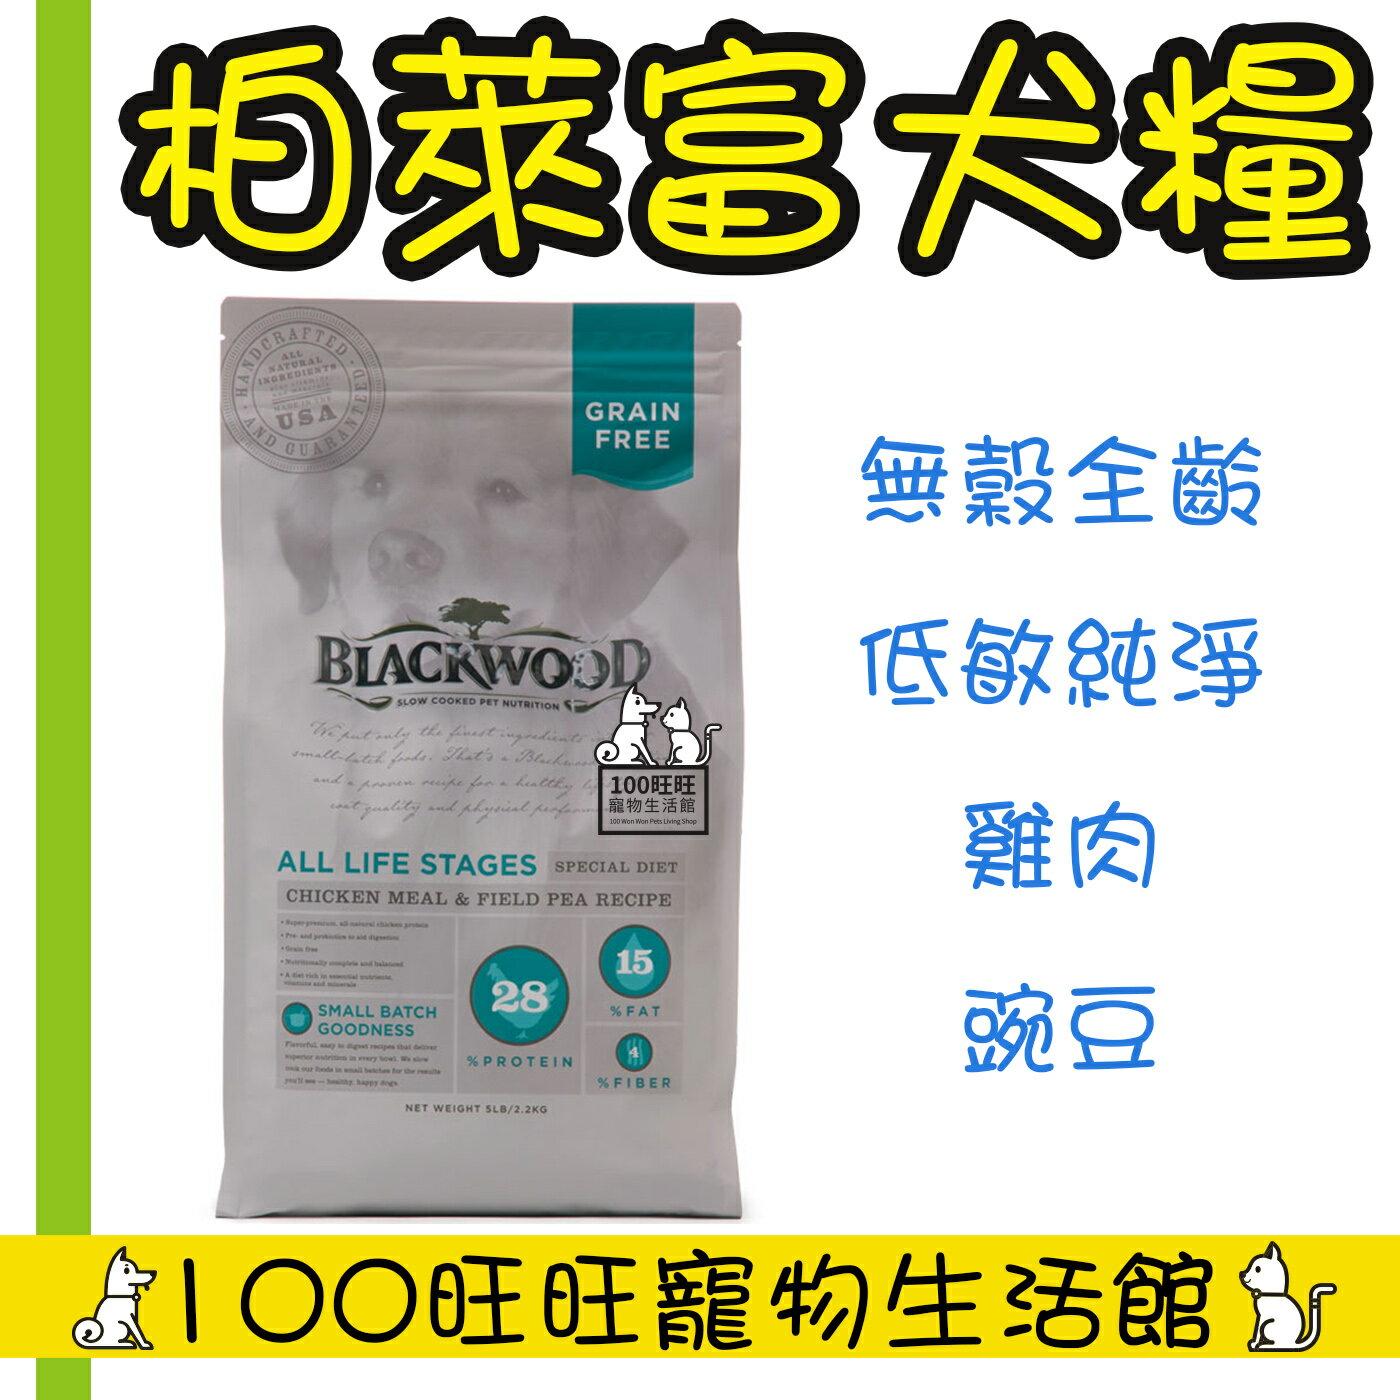 BLACKWOOD 柏萊富 無穀全齡 低敏純淨配方 1lb (雞肉+豌豆) 450g